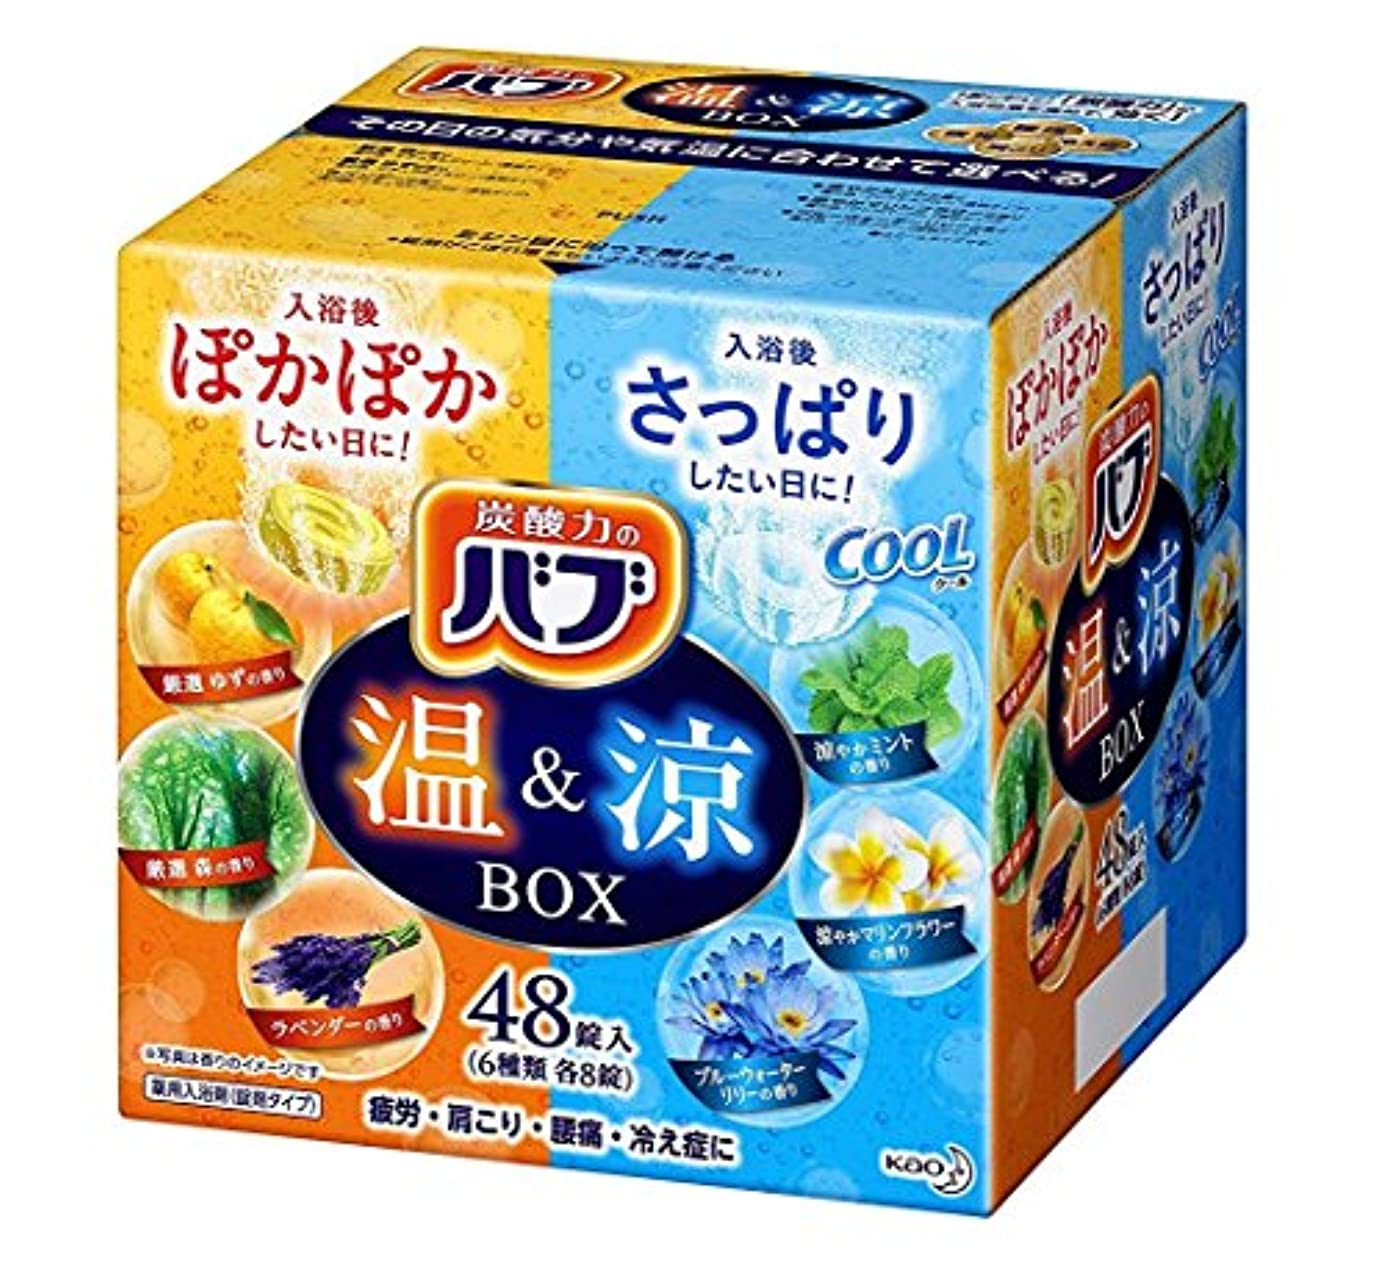 面倒家族暫定の【大容量】バブ 温&涼BOX 48錠 炭酸入浴剤